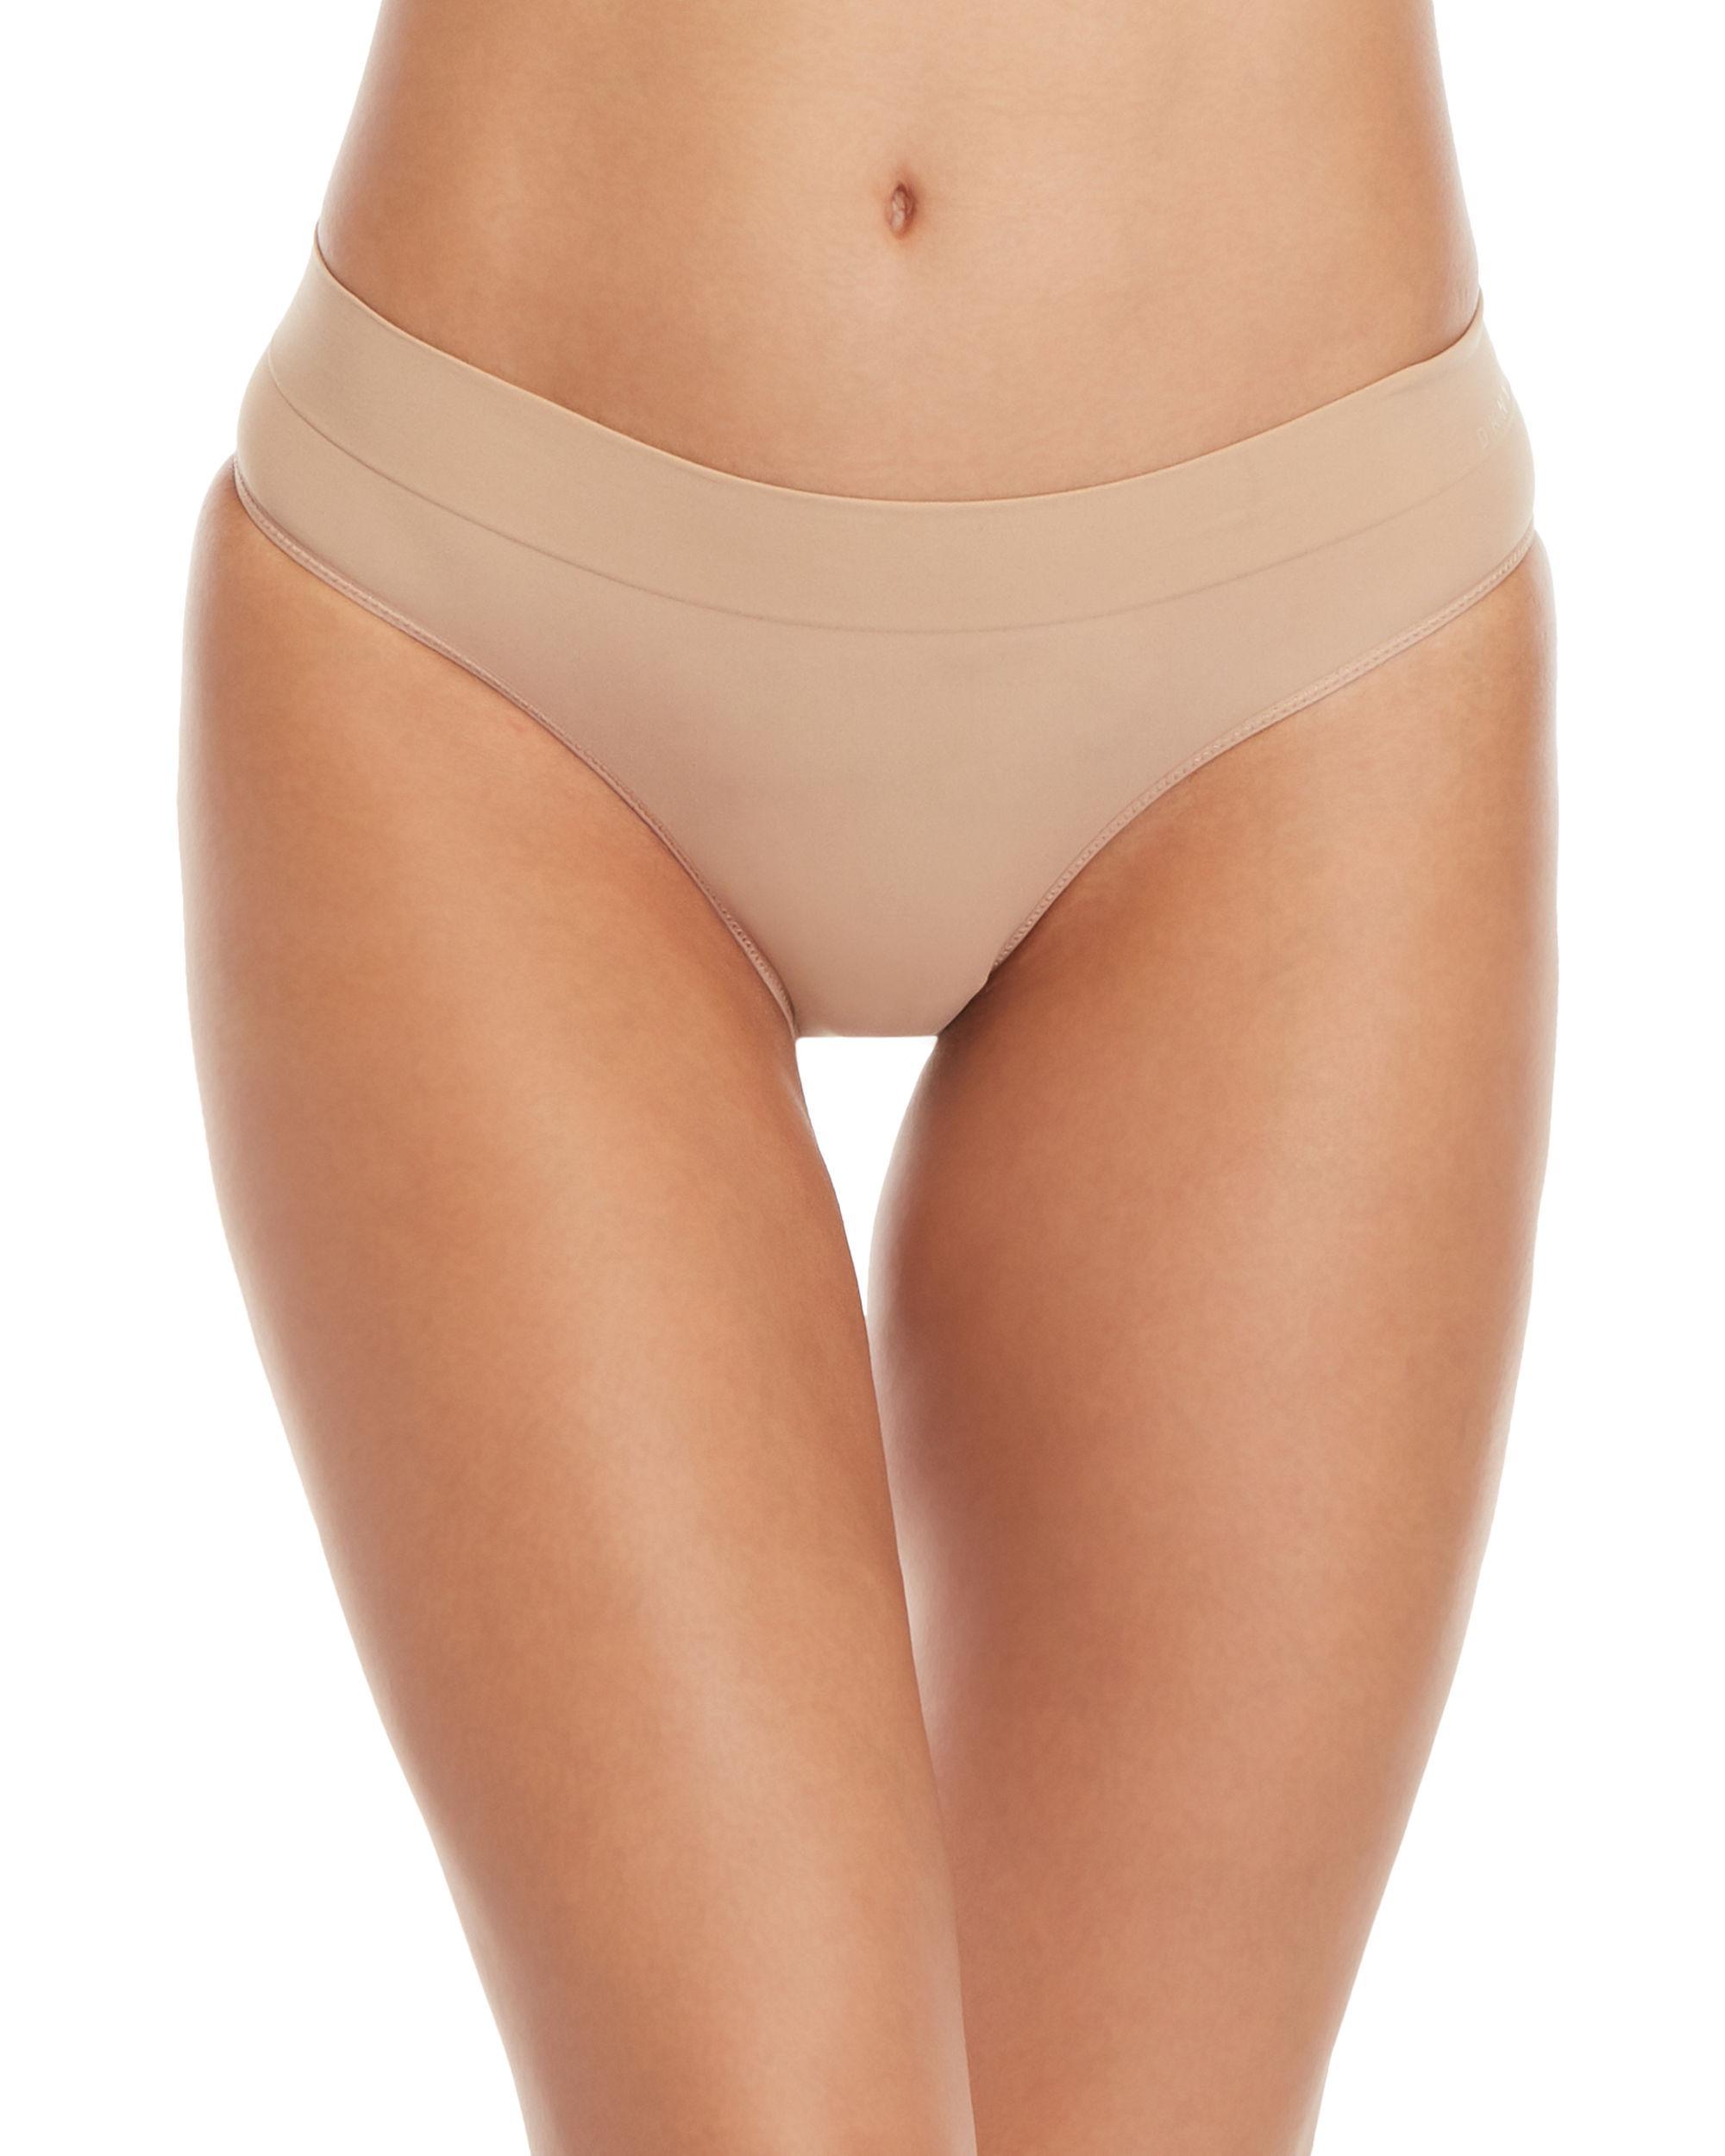 c67f0a0c346e DKNY. Women's Seamless Bikini Panty